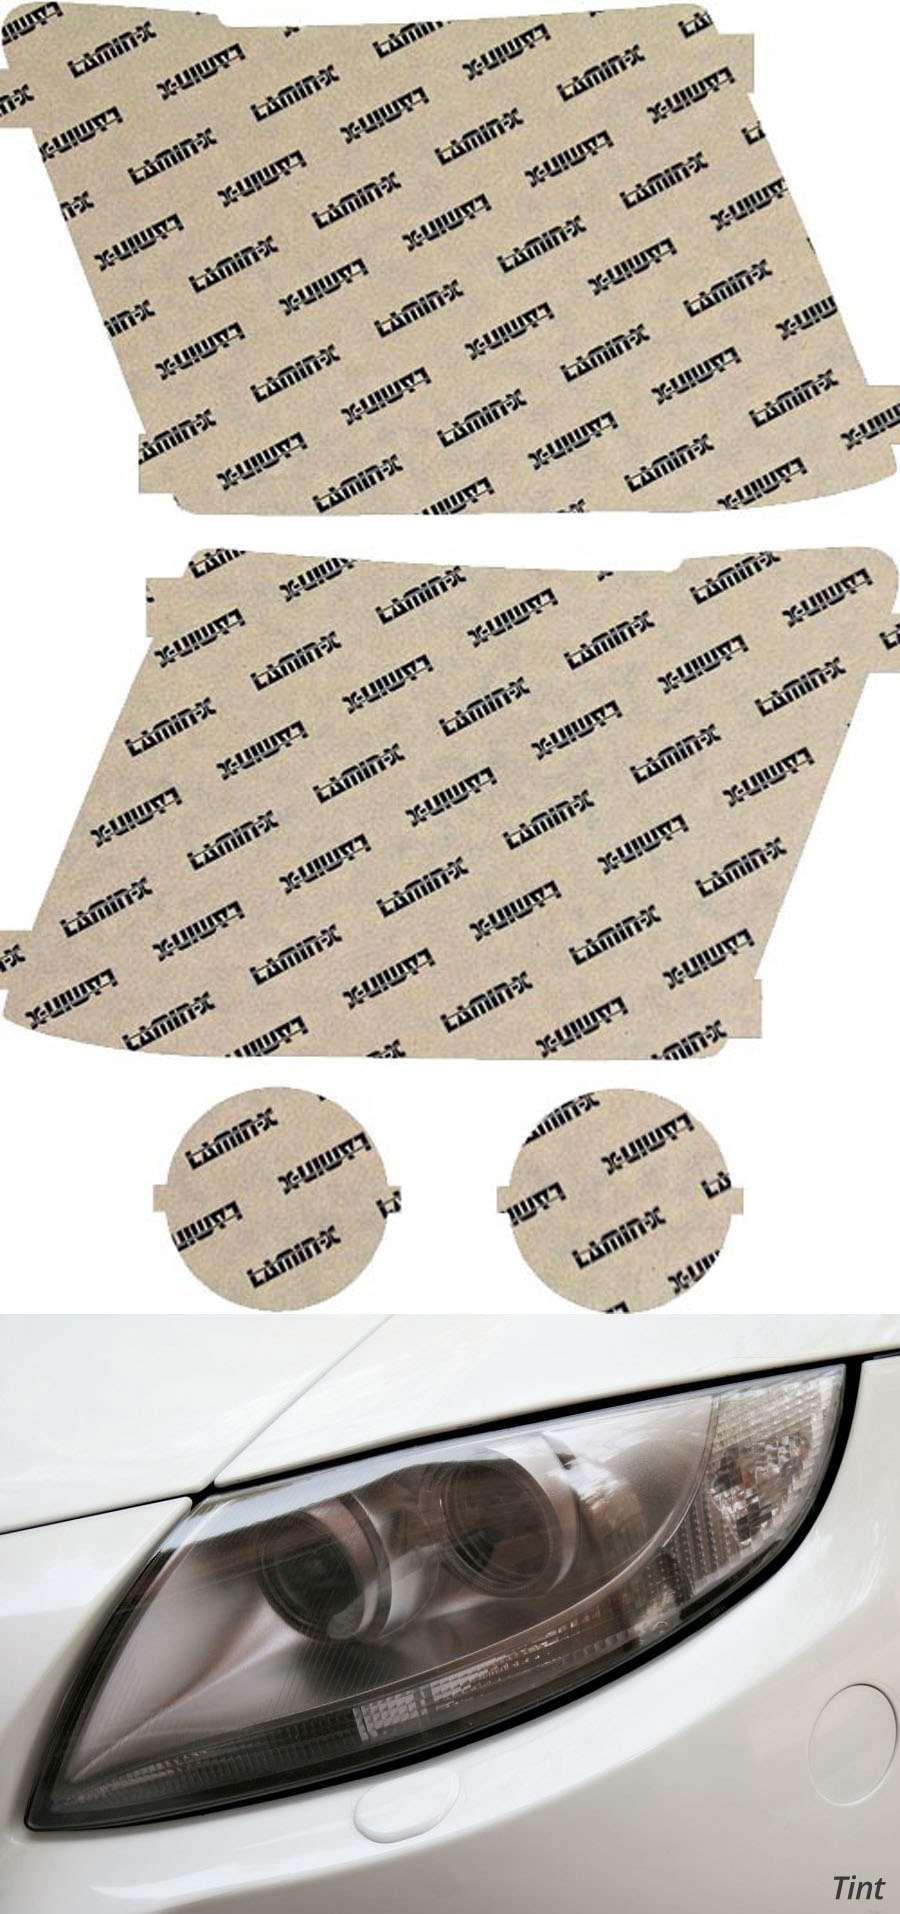 Nissan Xterra 05-15 Tint Lighting Covers Lamin-X N517T